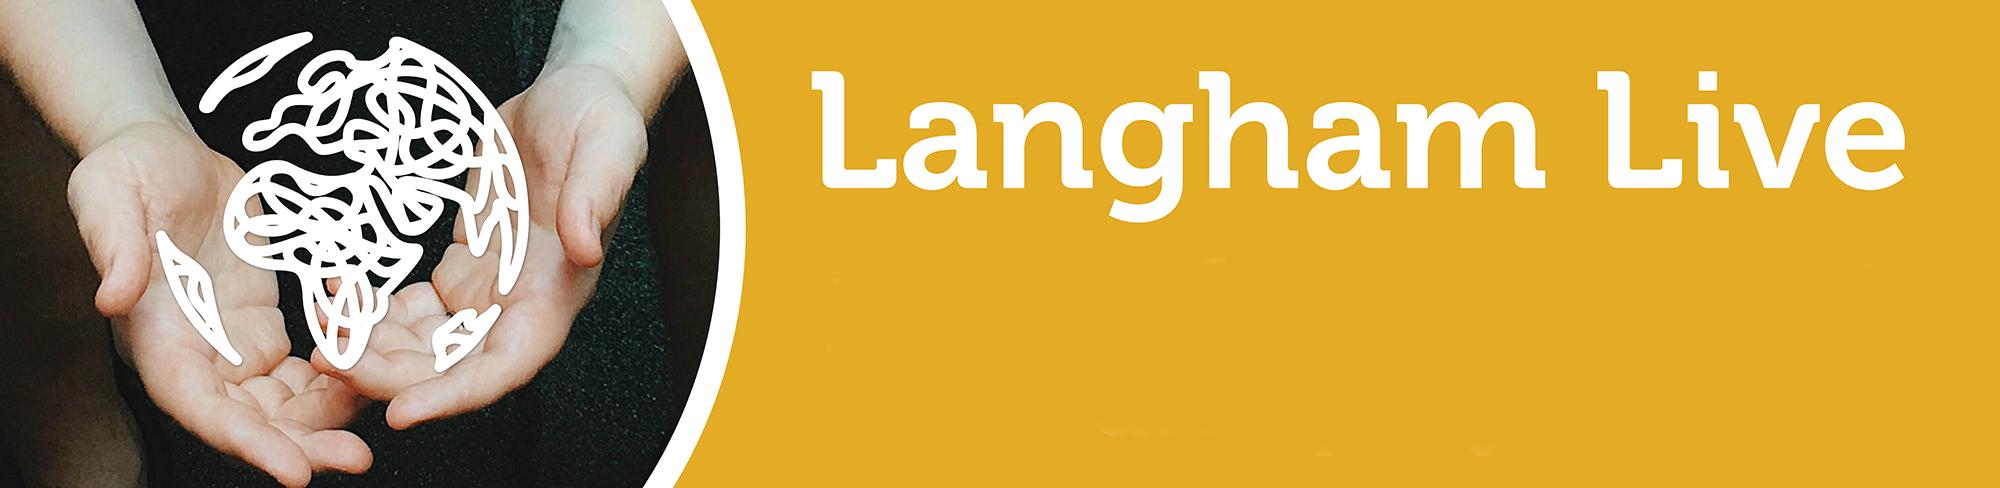 Langham Live